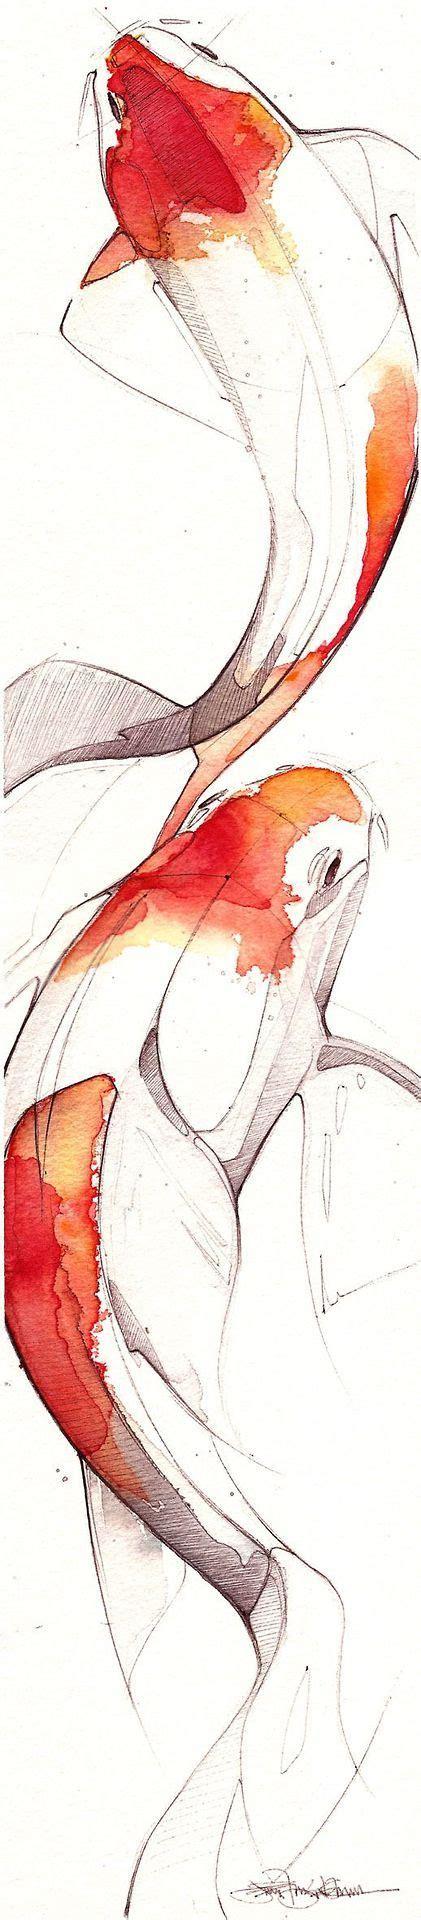 Drawing Towards Watercolor